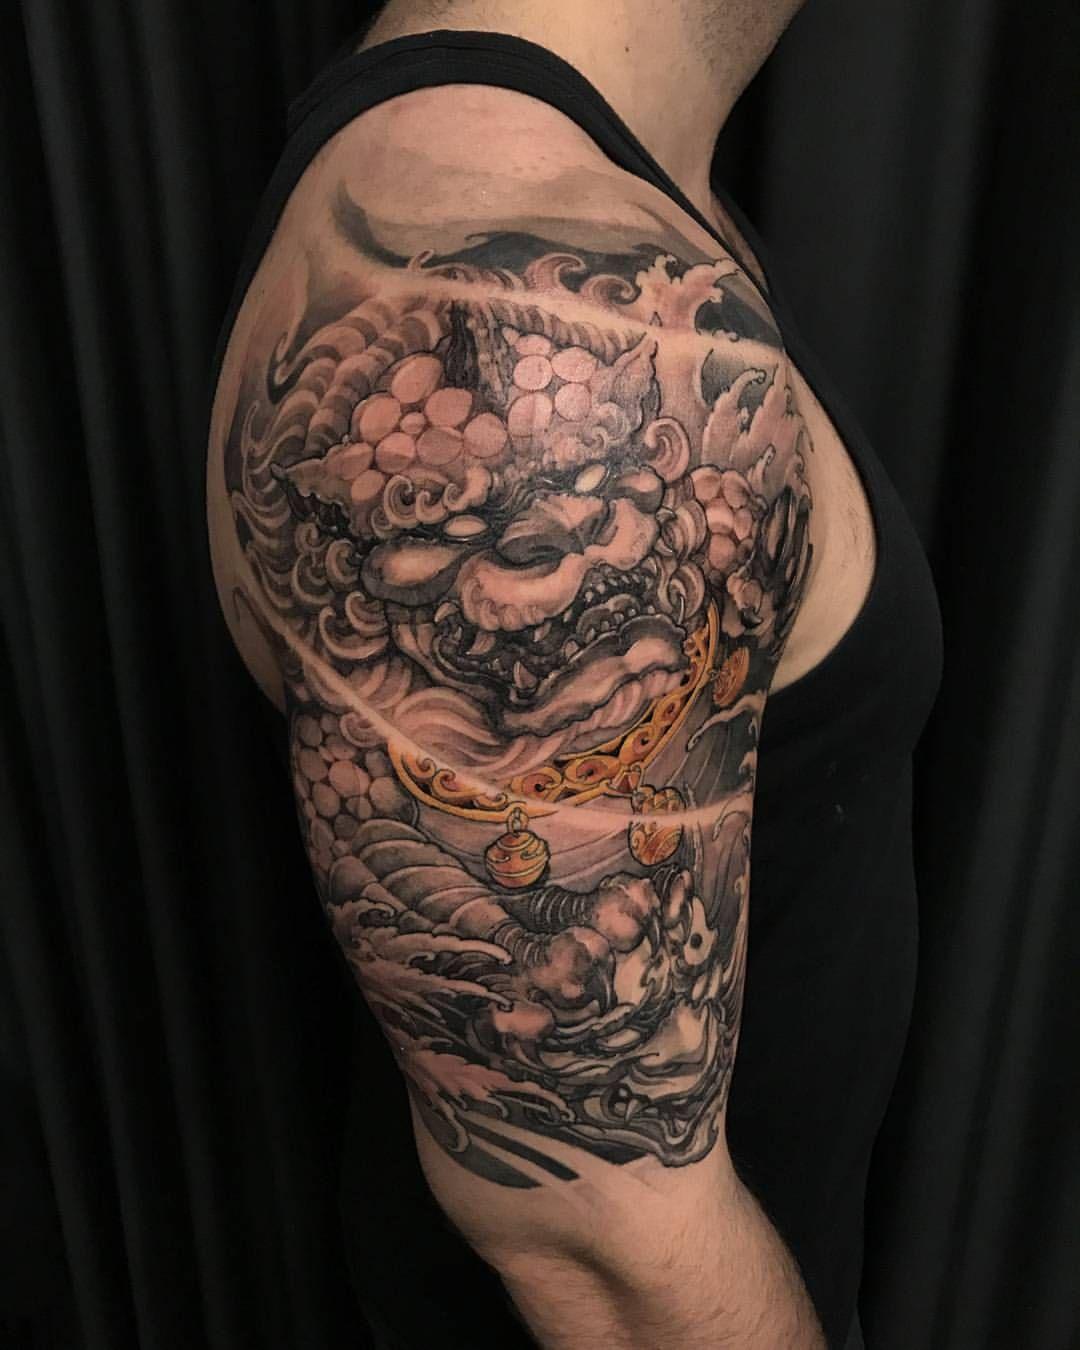 David Hoang On Instagram Back To Back Tiger Tattoo: Foodog And Hannya. #chronicink #asiantattoo #asianink